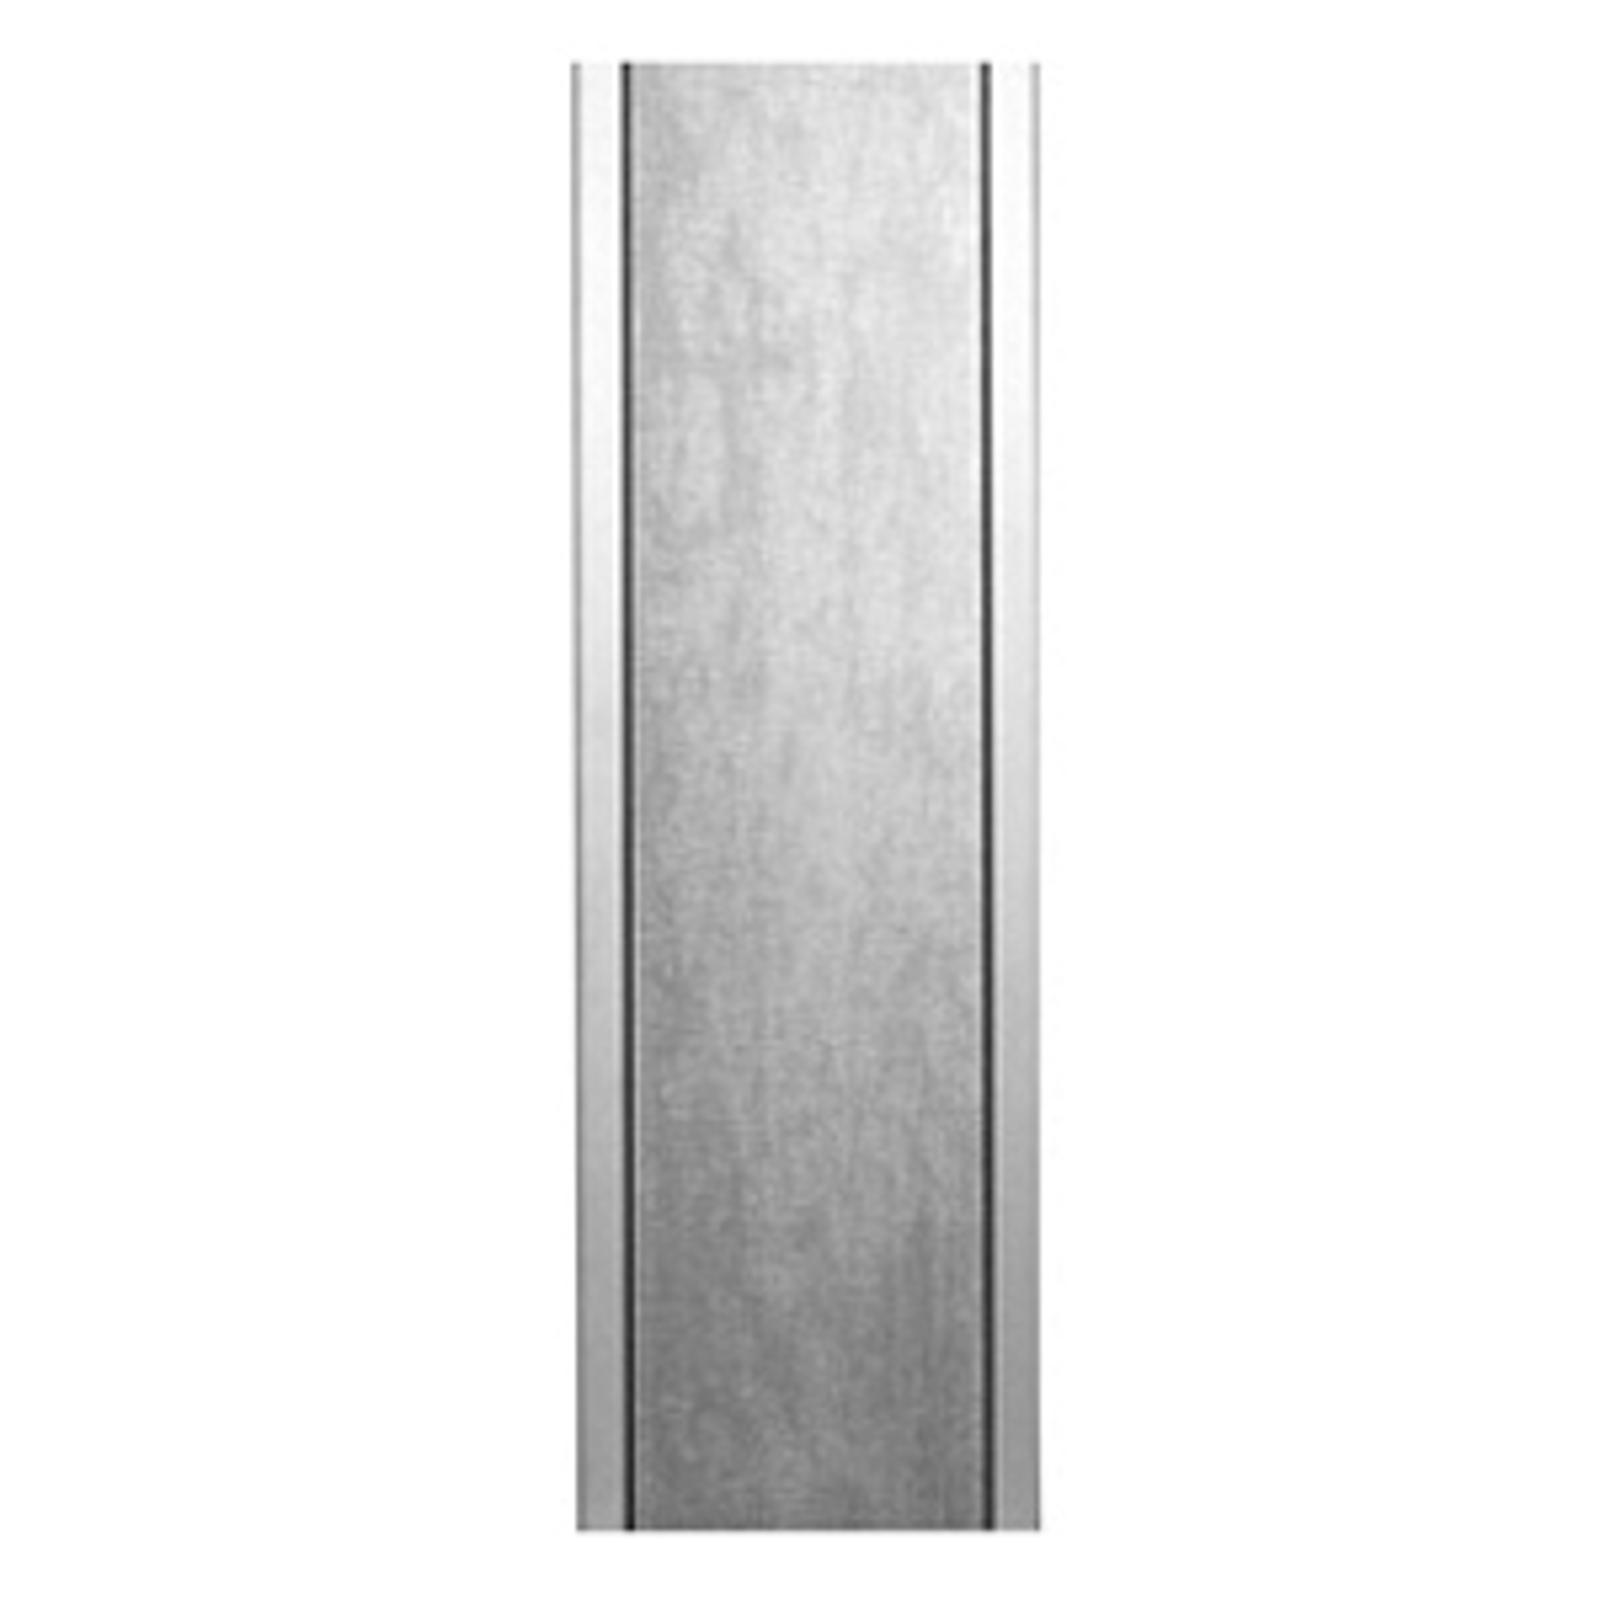 Elegant letterbox stand 1001_1045073_1